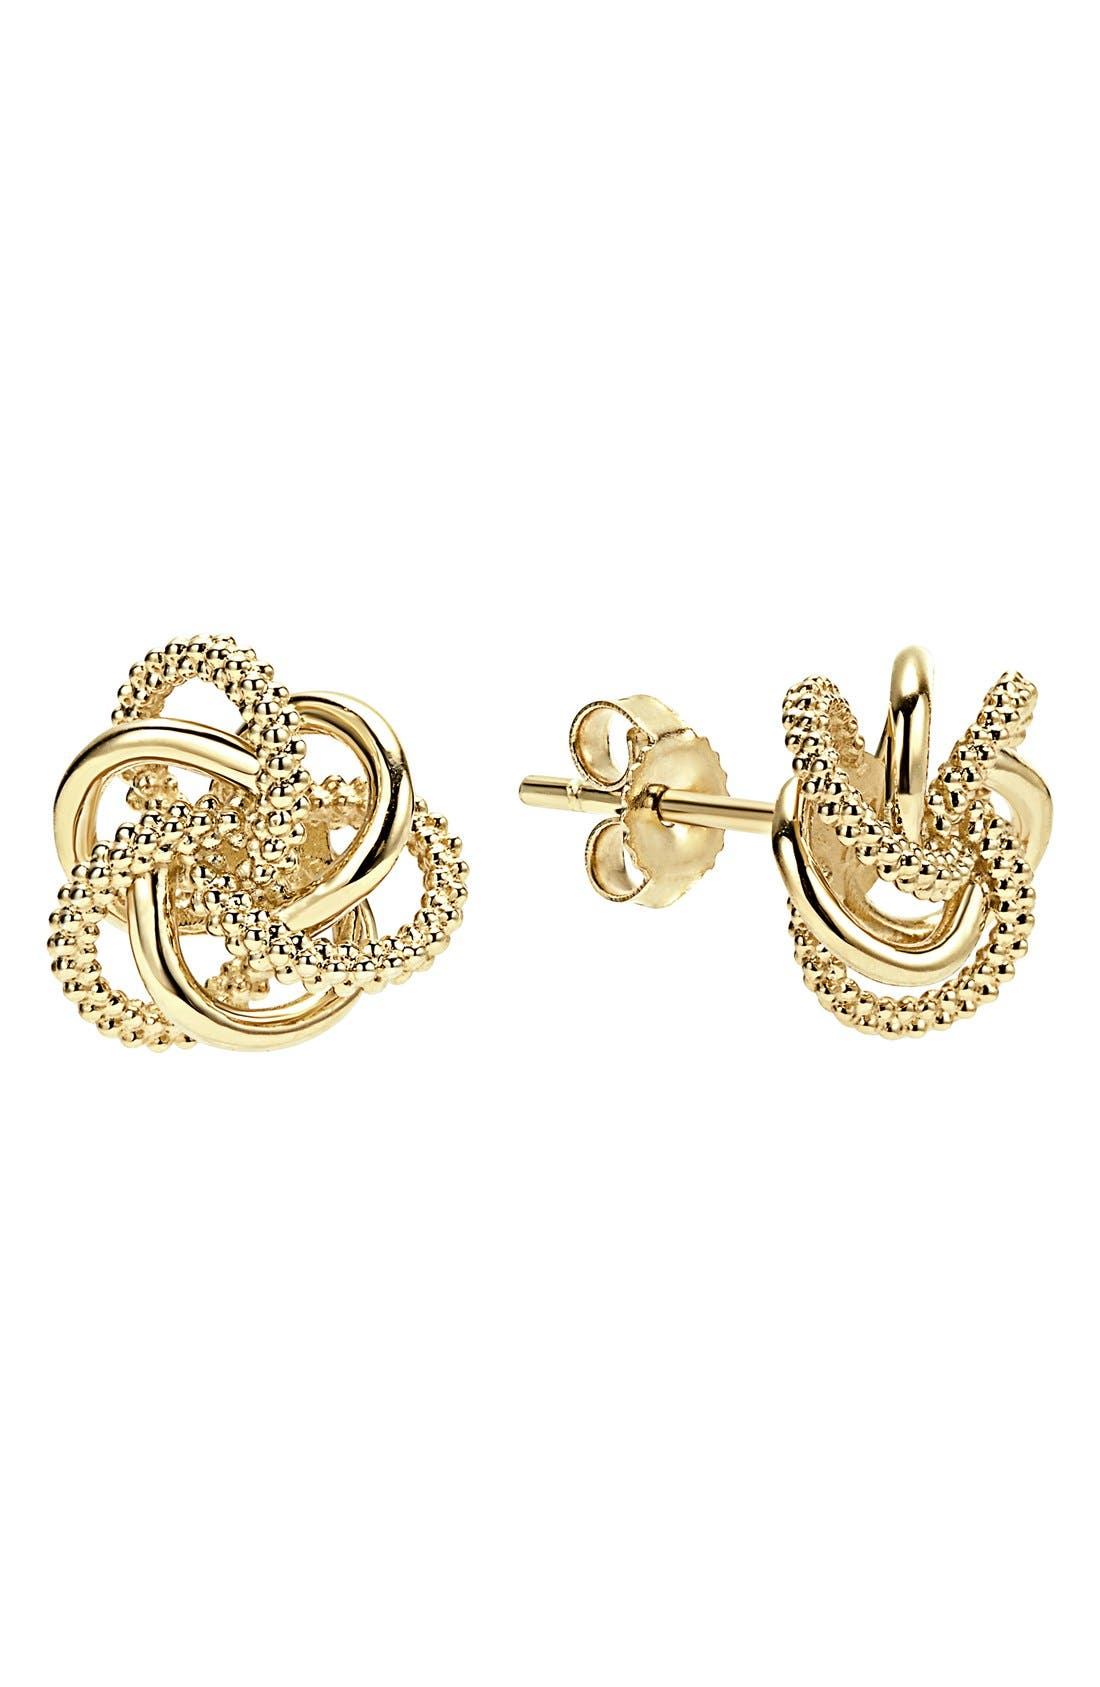 Main Image - LAGOS 'Love Knot' 18k Gold Stud Earrings